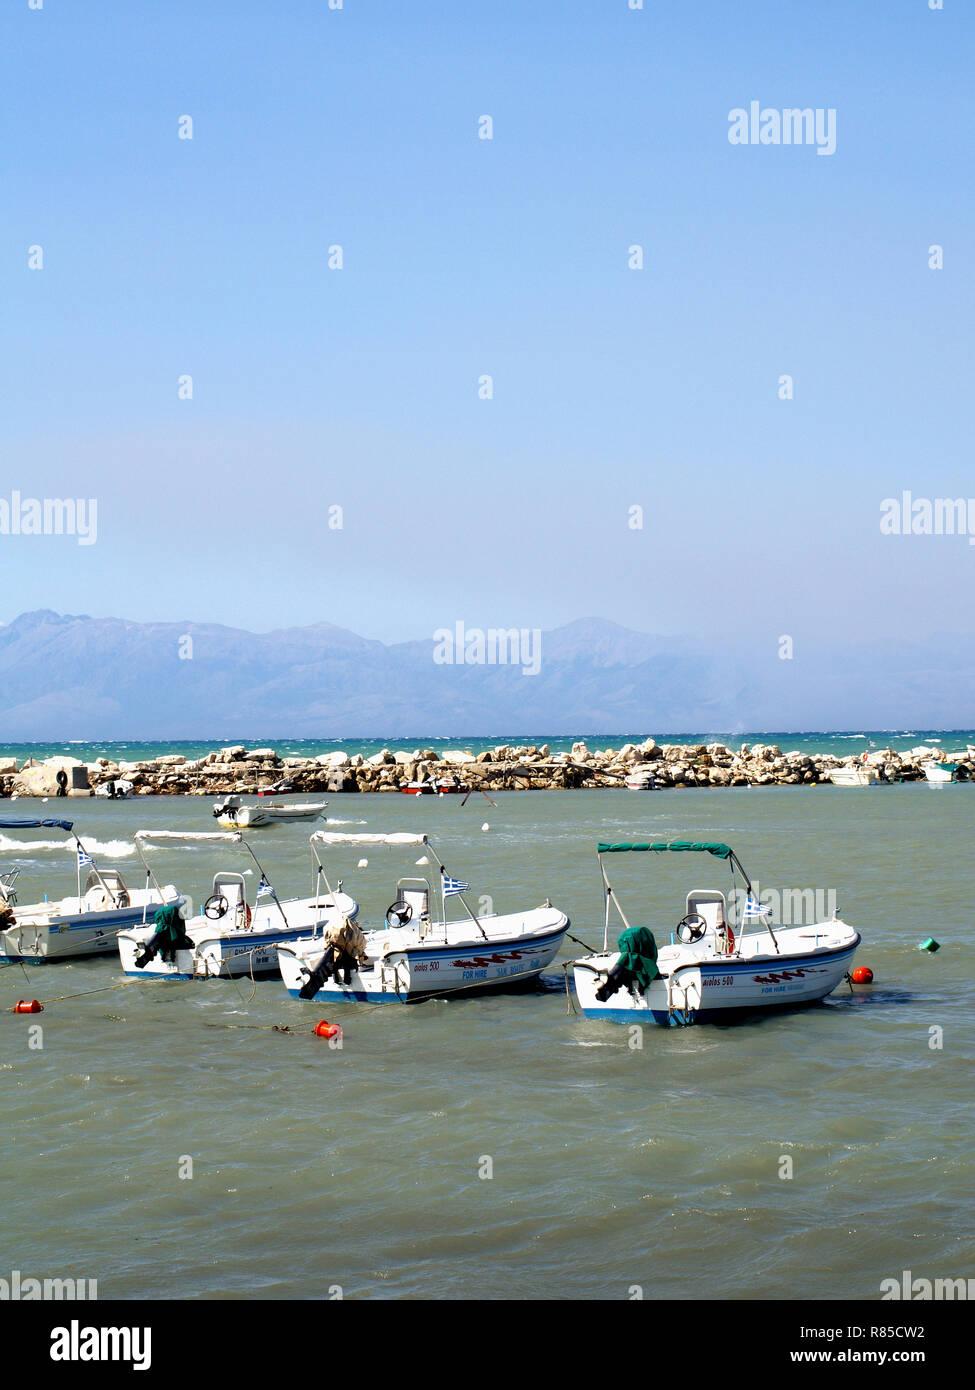 Boats For Hire, Roda, Corfu, Greece - Stock Image